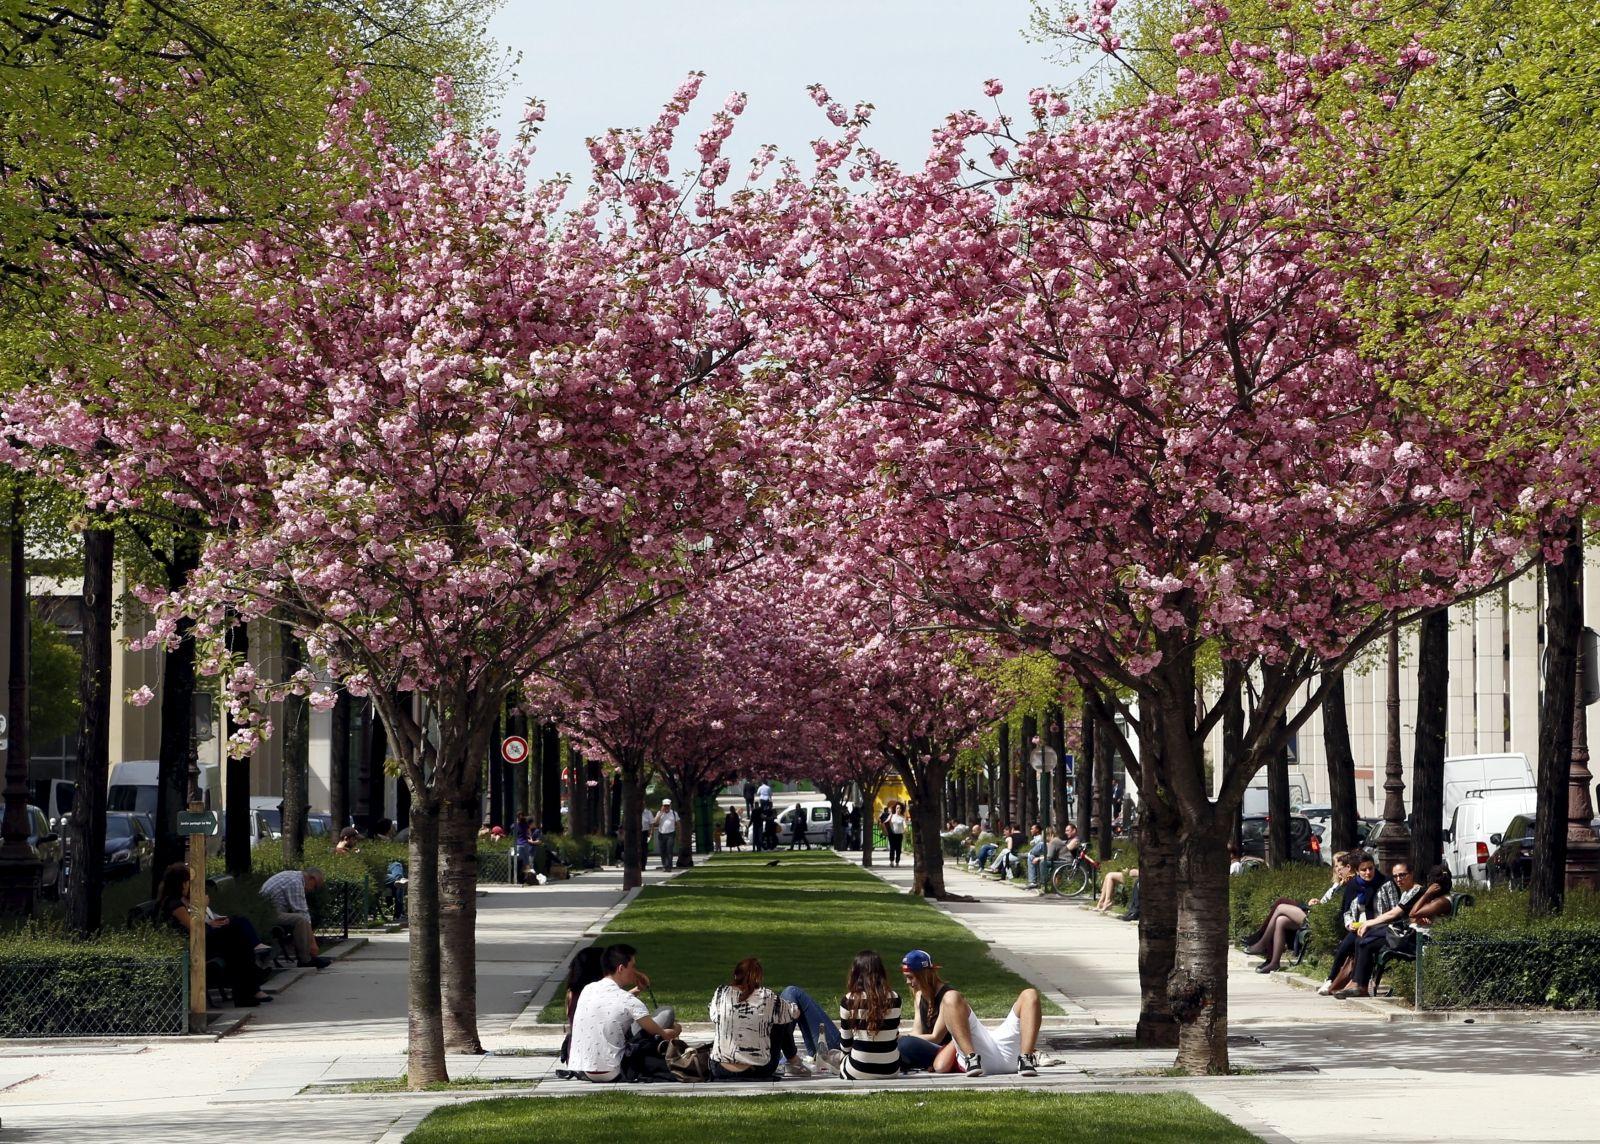 Urban trees health benefits